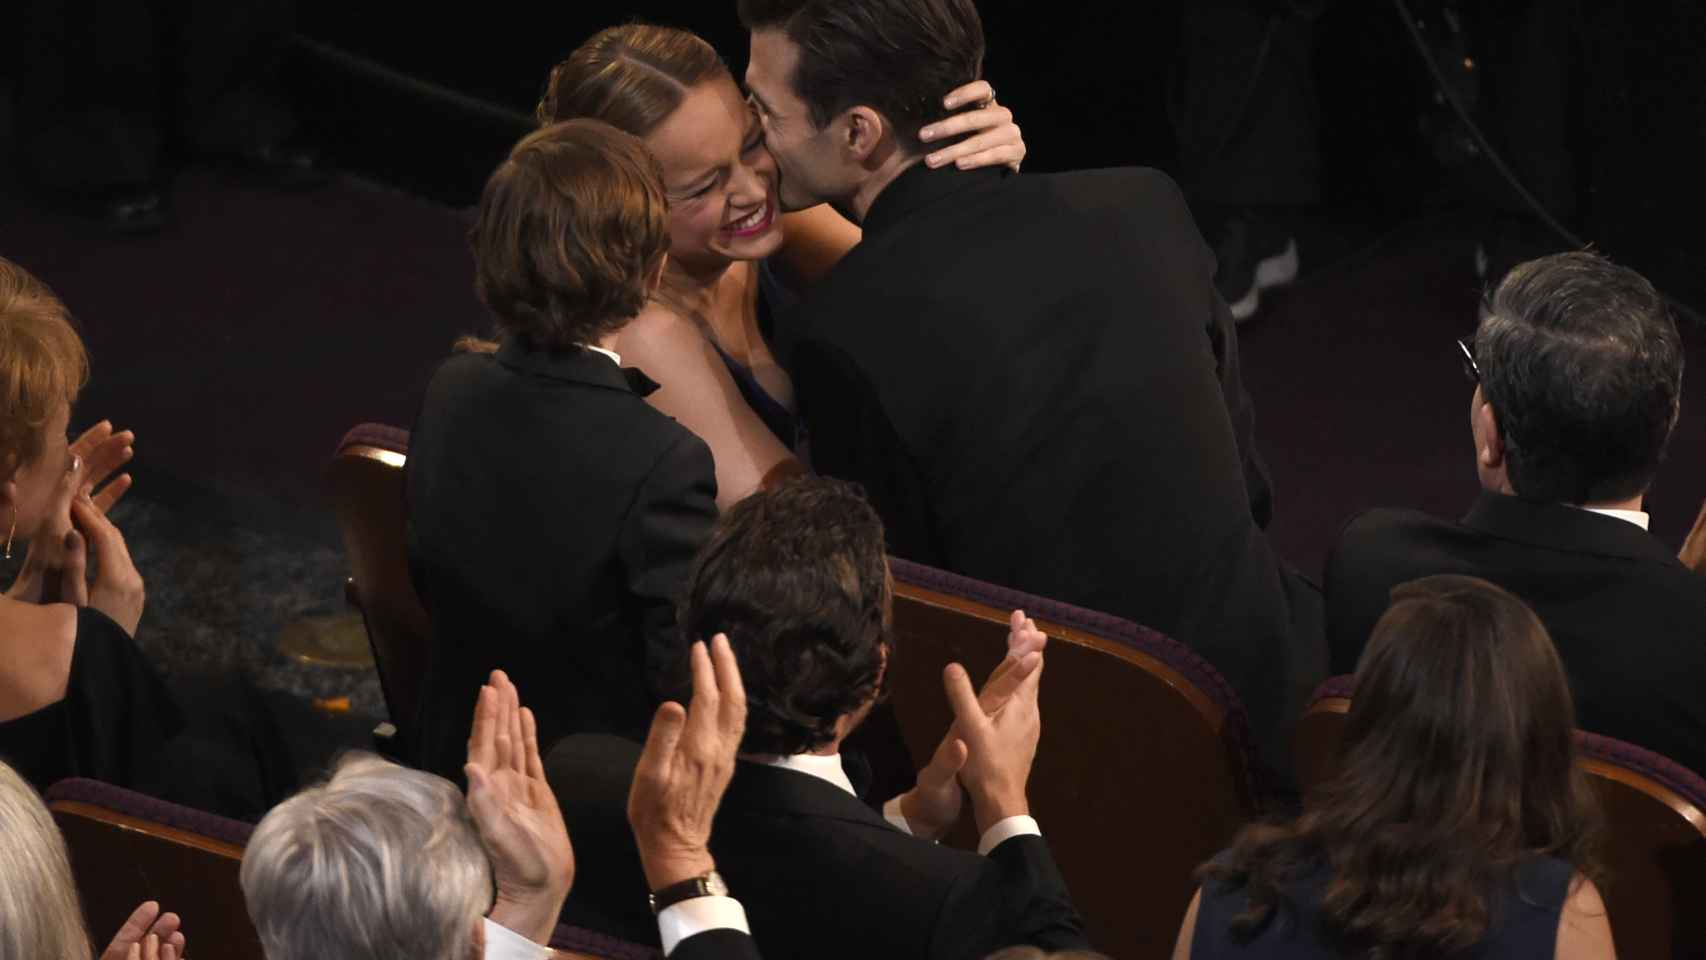 Brie Larson besa a su pareja Alex Greenwald antes de recoger la estatuilla